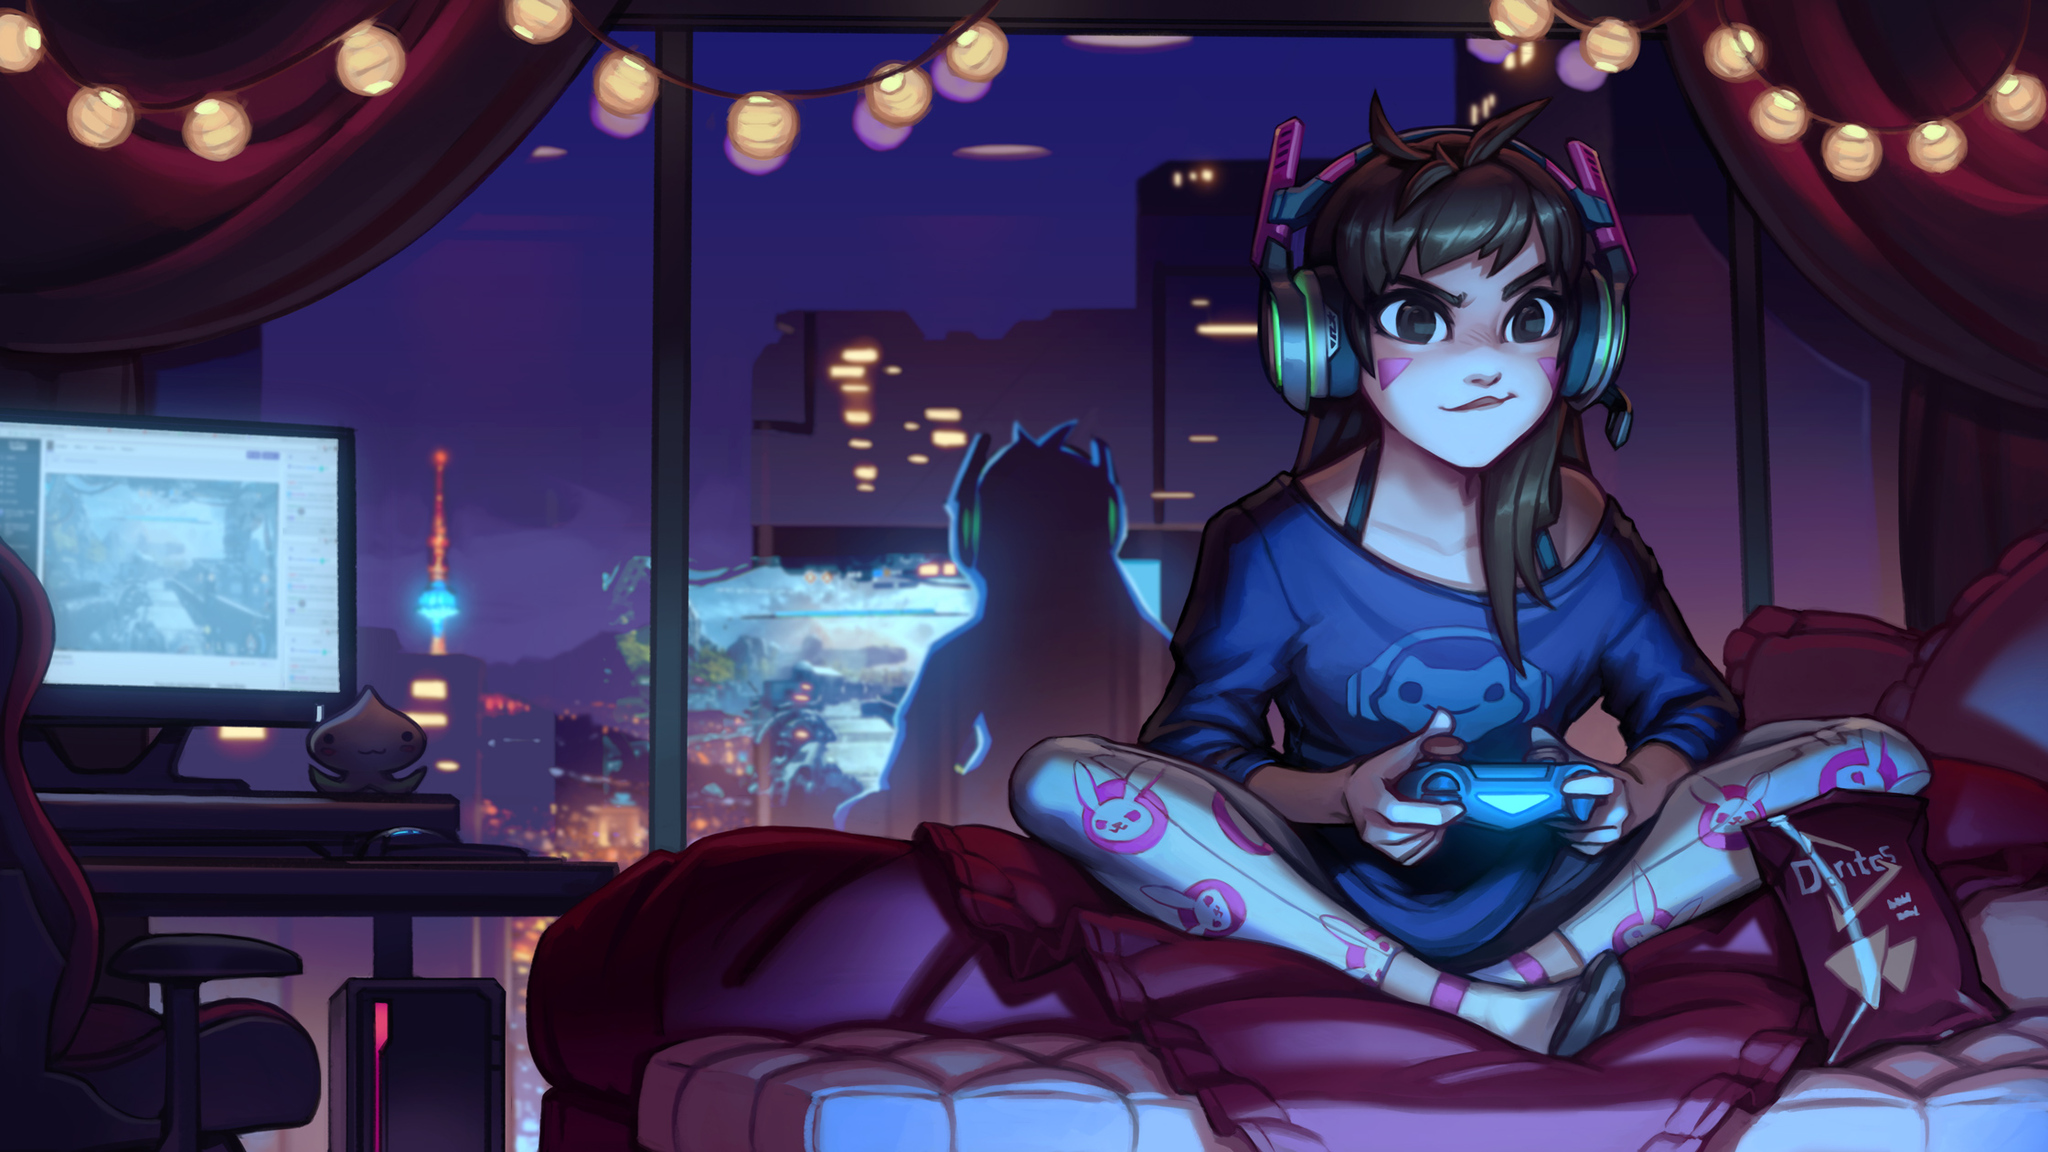 2048x1152 Dva Overwatch Cute Artwork 2048x1152 Resolution Hd 4k